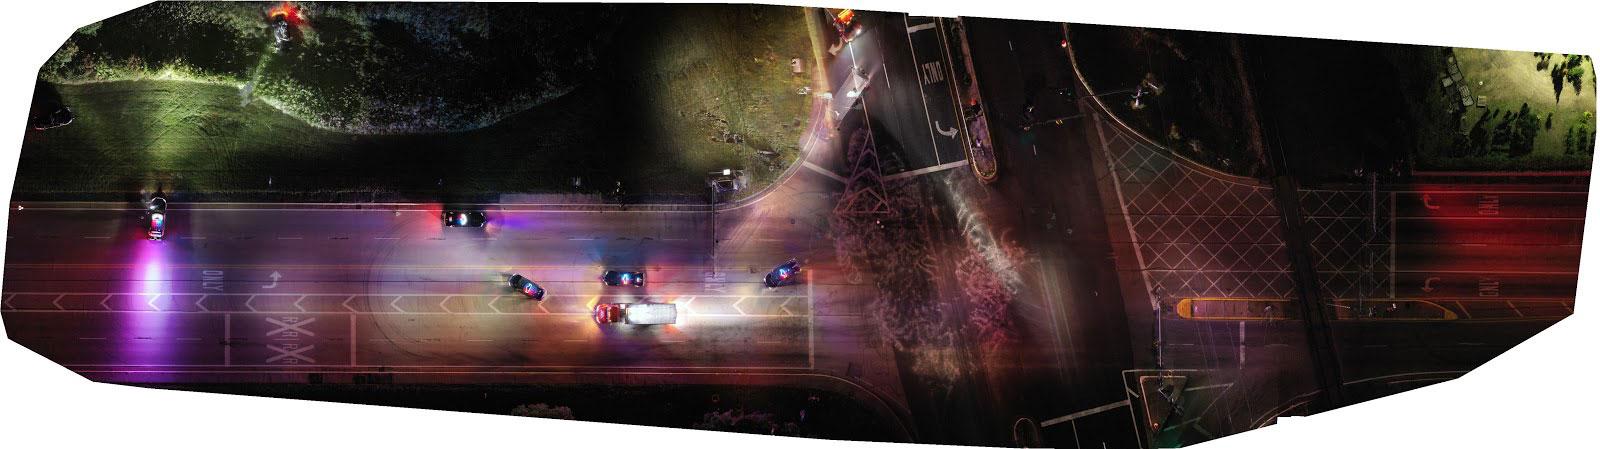 orthomosaic output of a traffic crash scene created in Pix4Dmapper